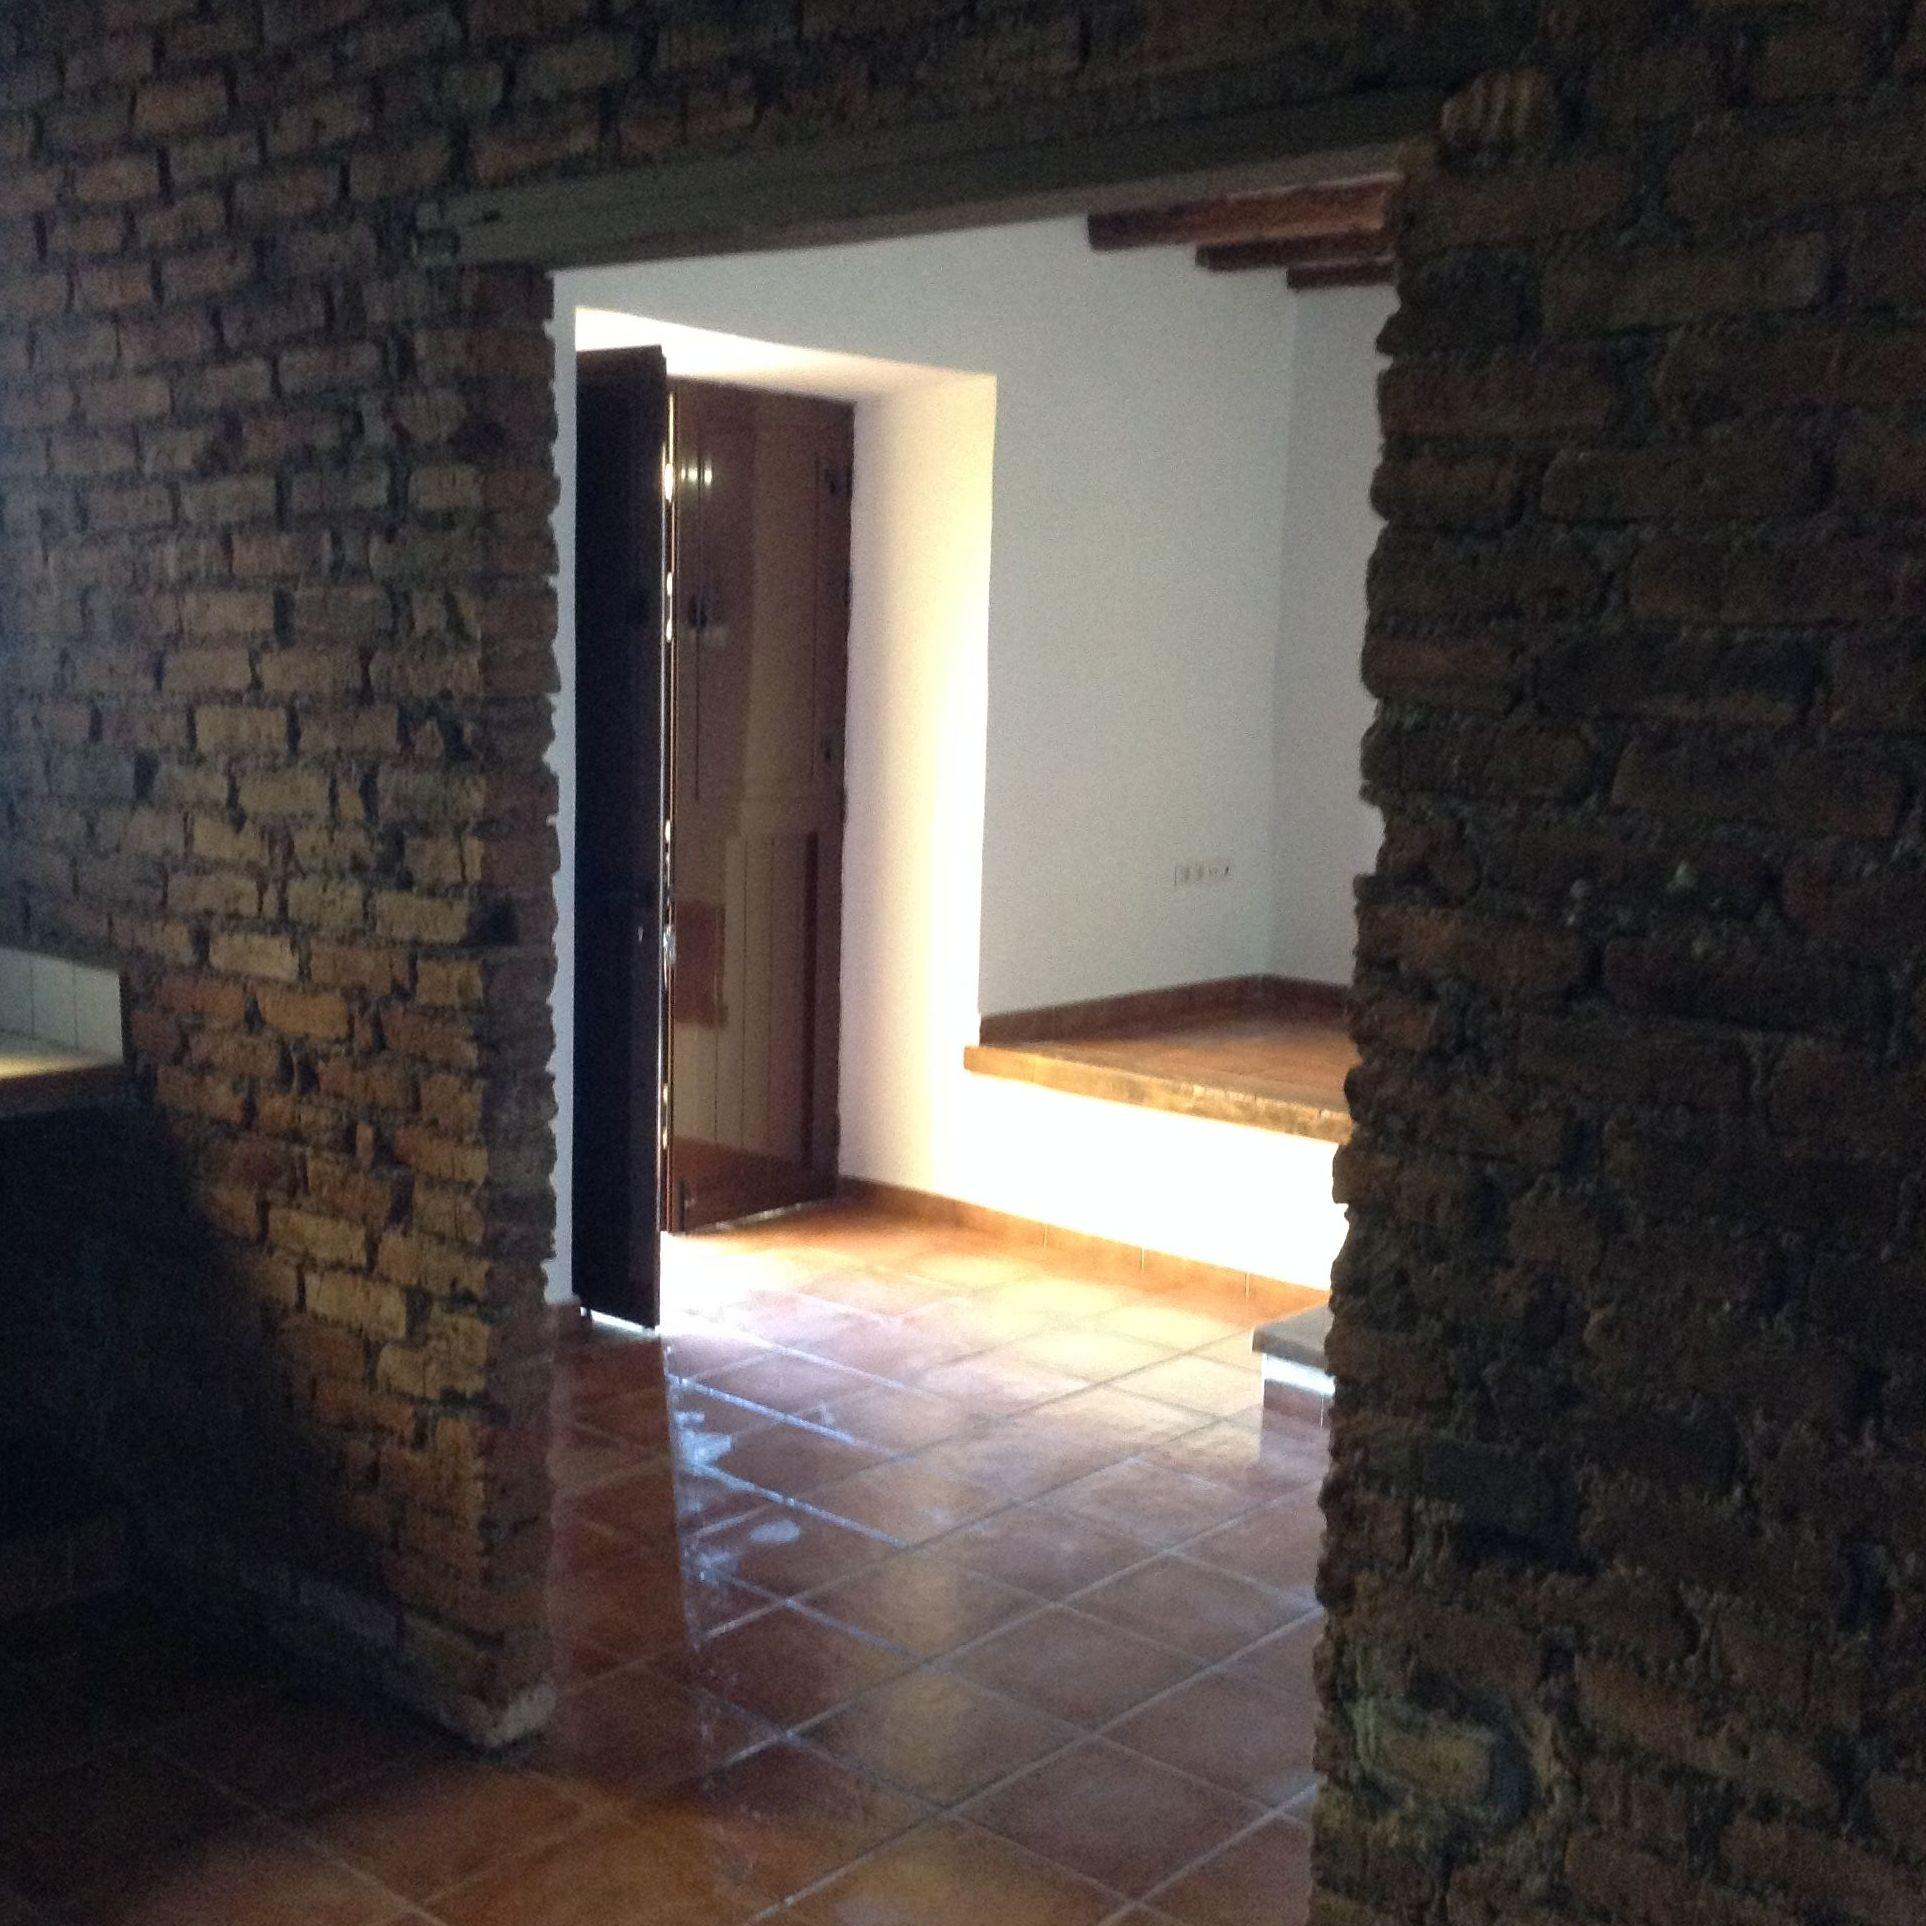 Reforma completa de vivienda en Santa Cruz de Tenerife. El Sauzal